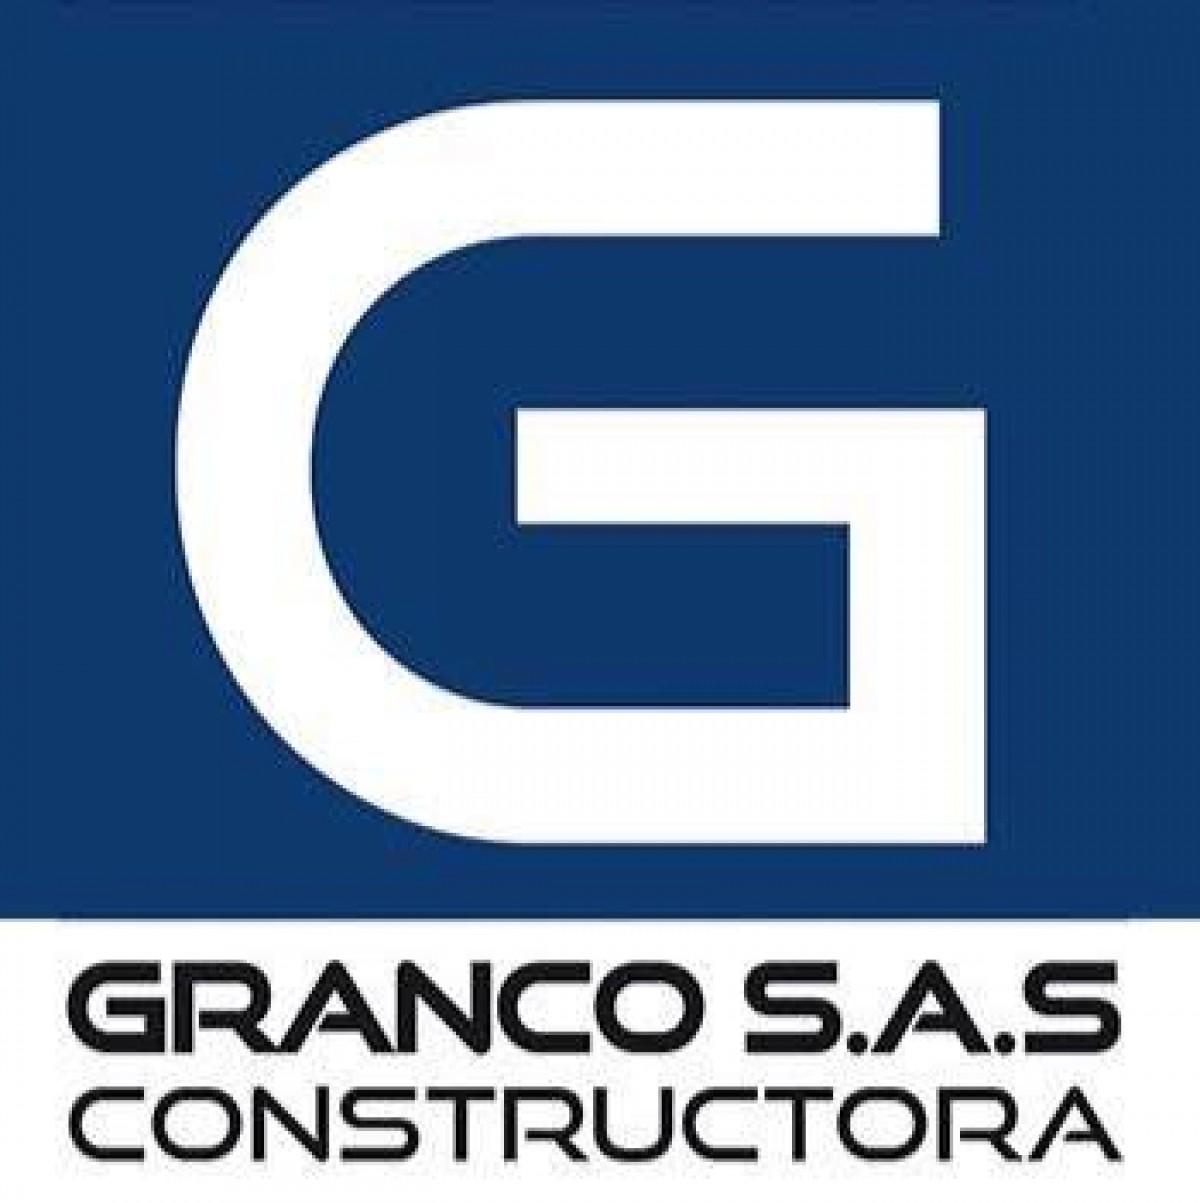 Constructora granco sas construyored for Constructora